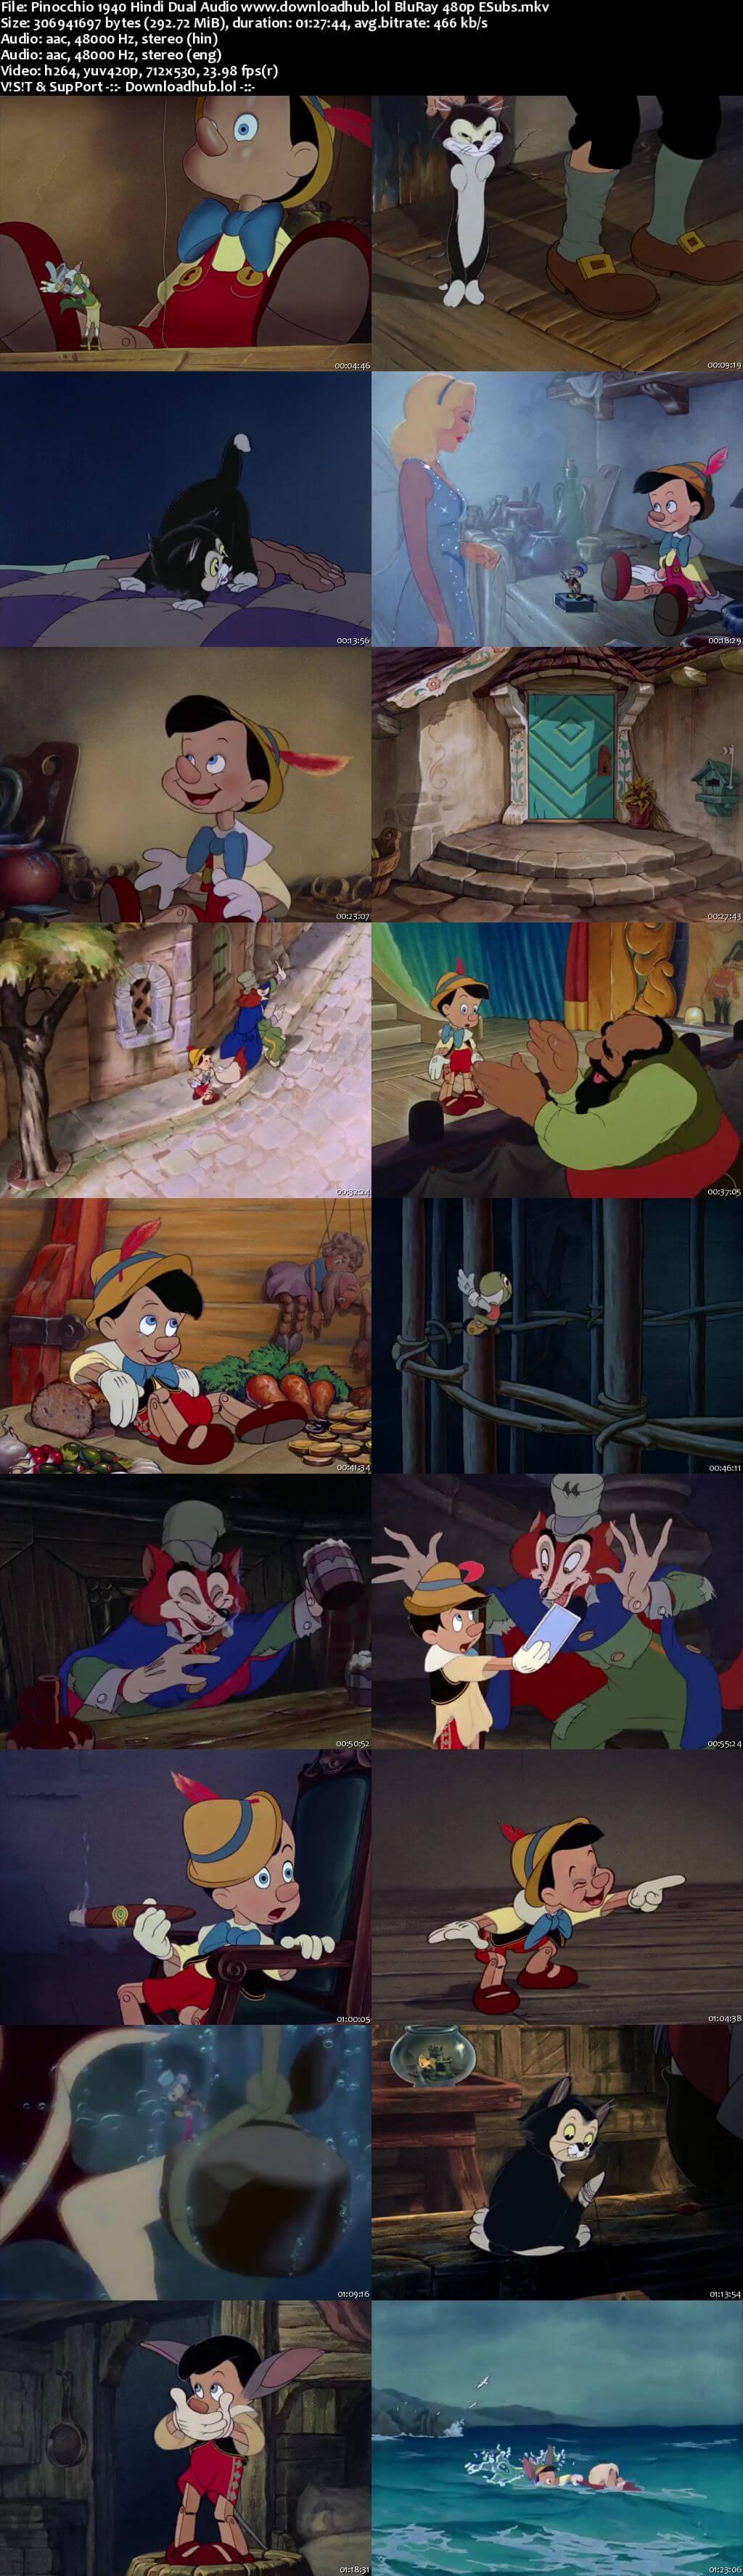 Pinocchio 1940 Hindi Dual Audio 280MB BluRay 480p ESubs